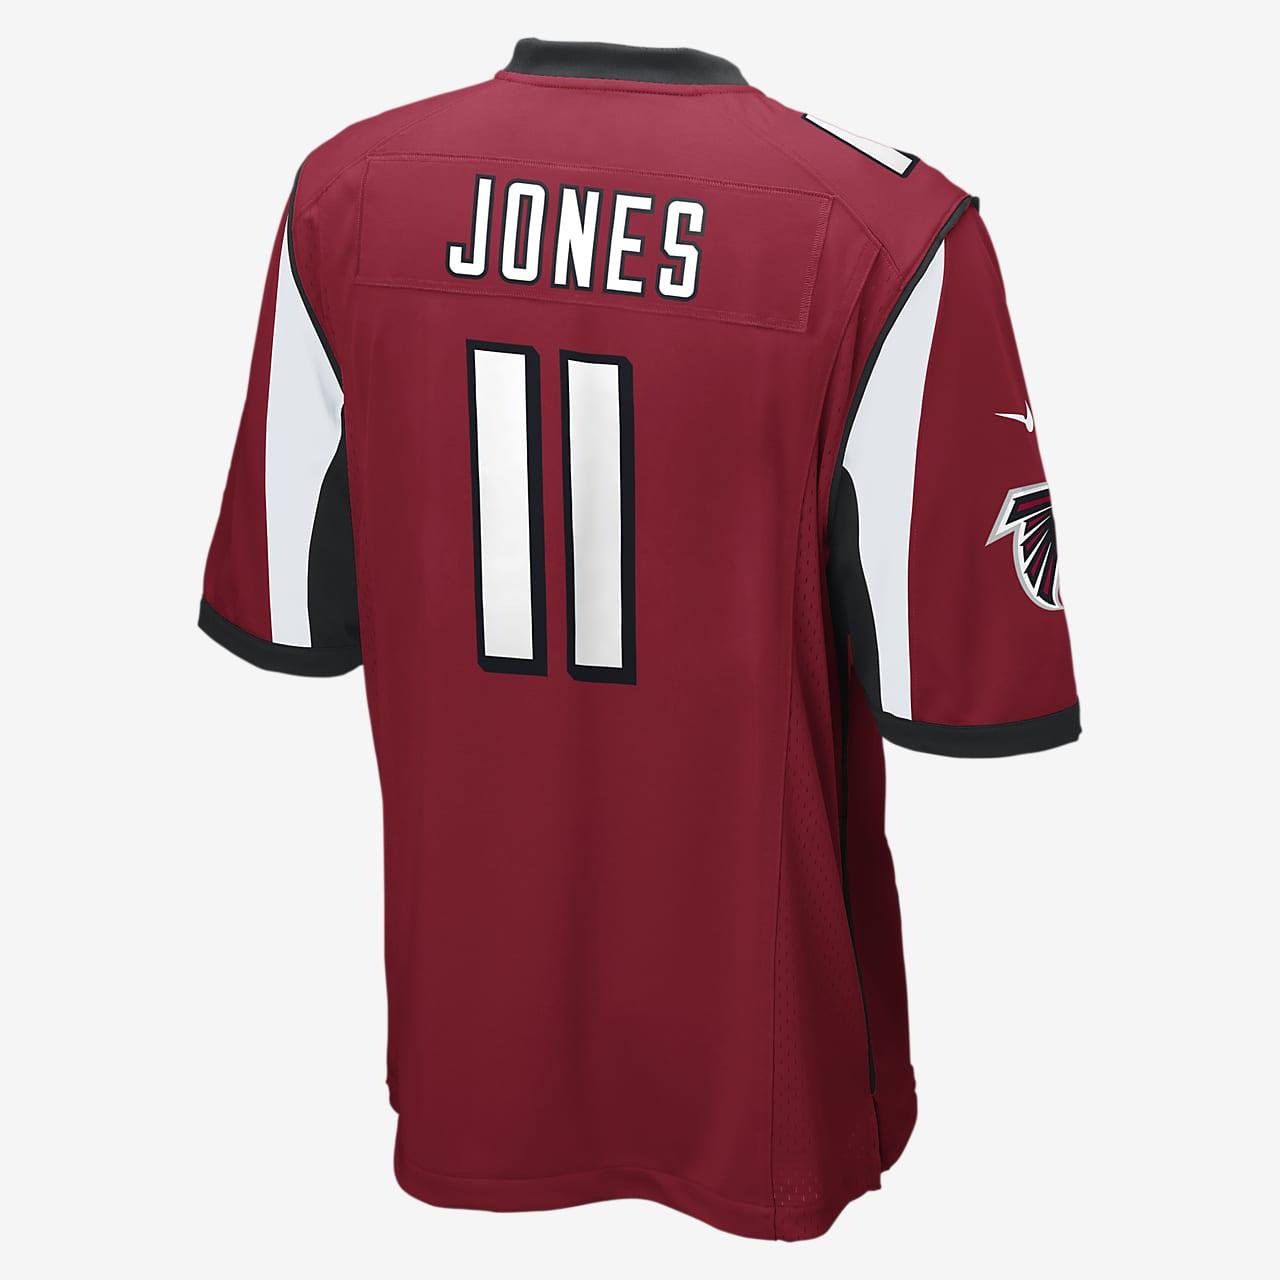 NFL Atlanta Falcons (Julio Jones) Kids' Football Home Game Jersey